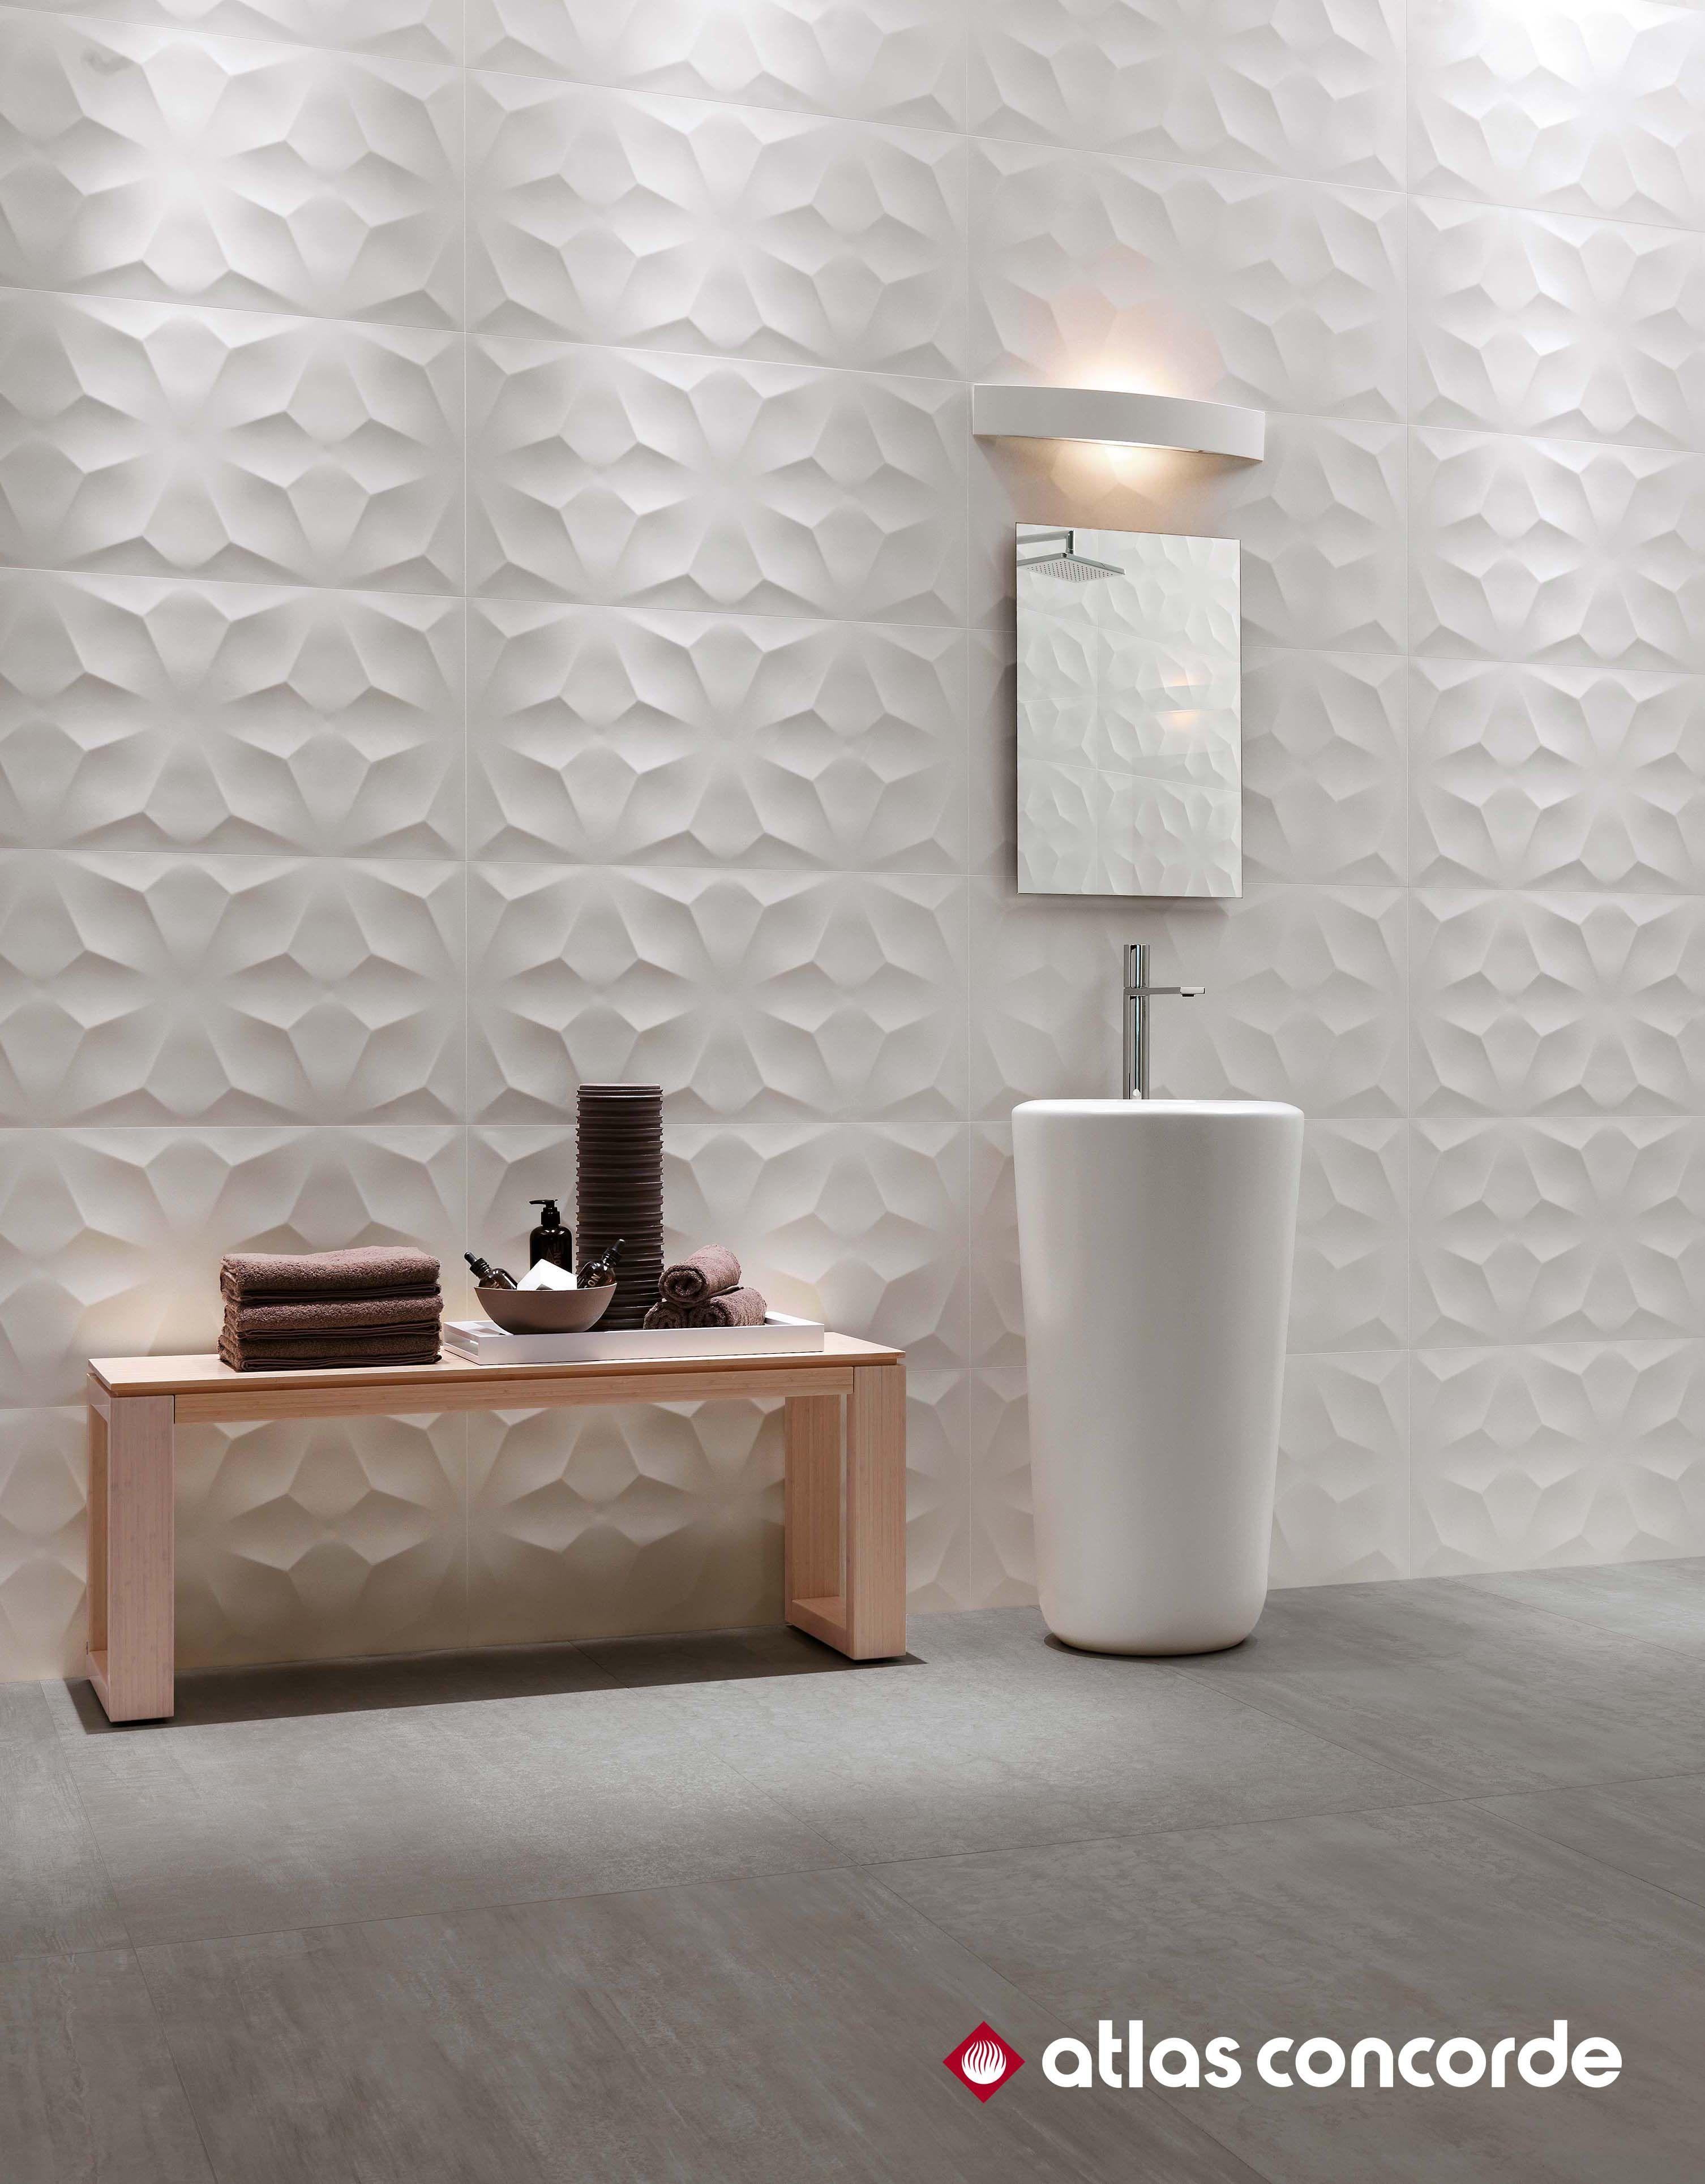 3D Wall Design Diamond Geometrical design relief